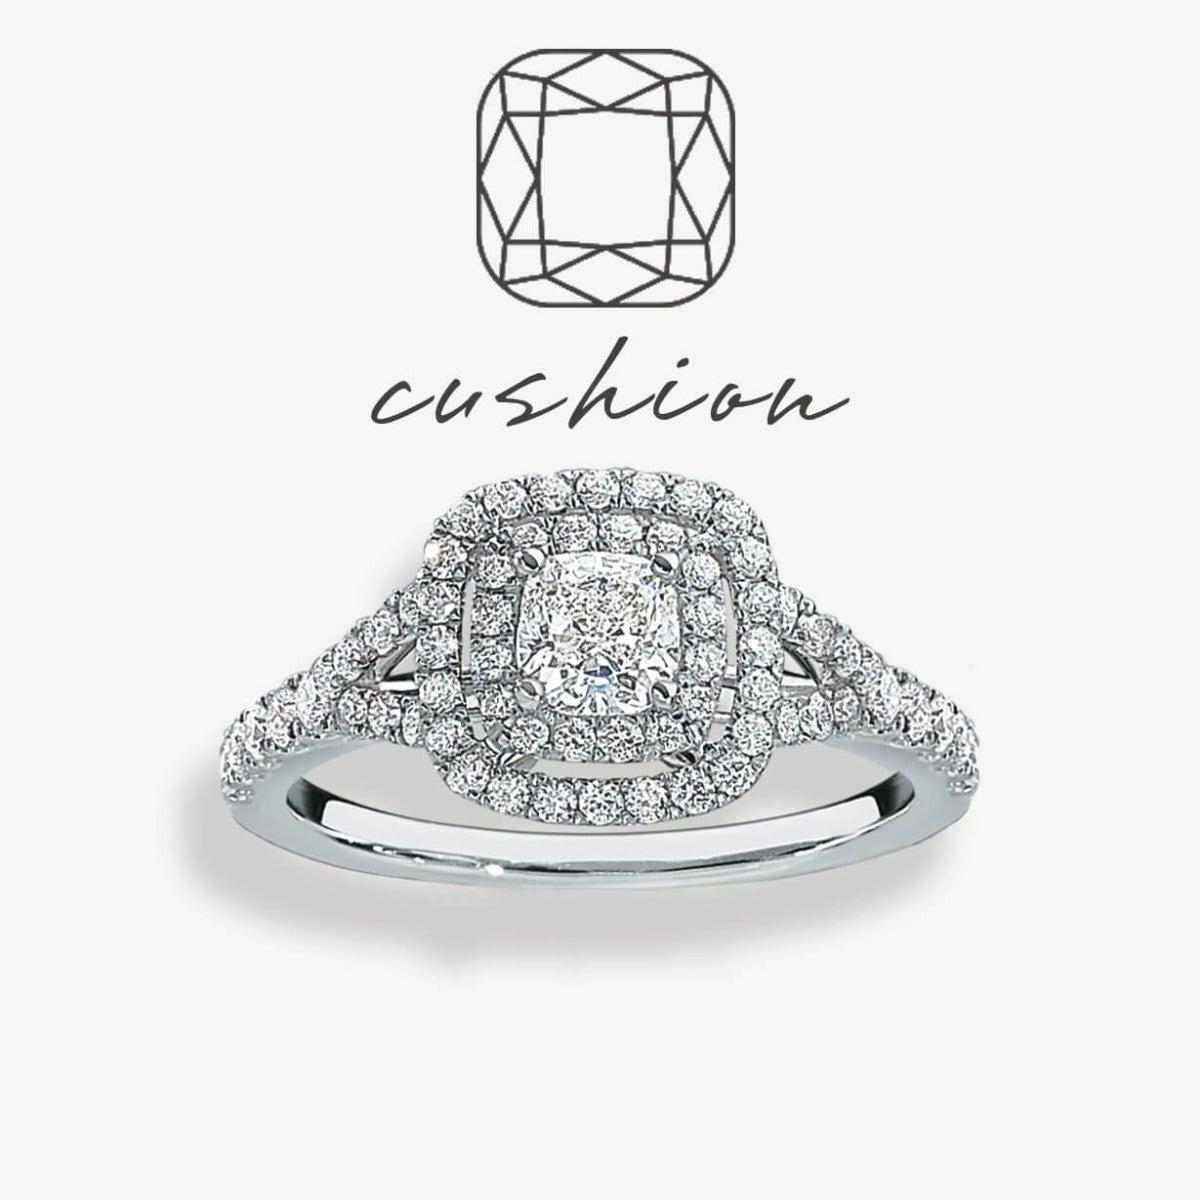 Cushion-Cut Diamond Style